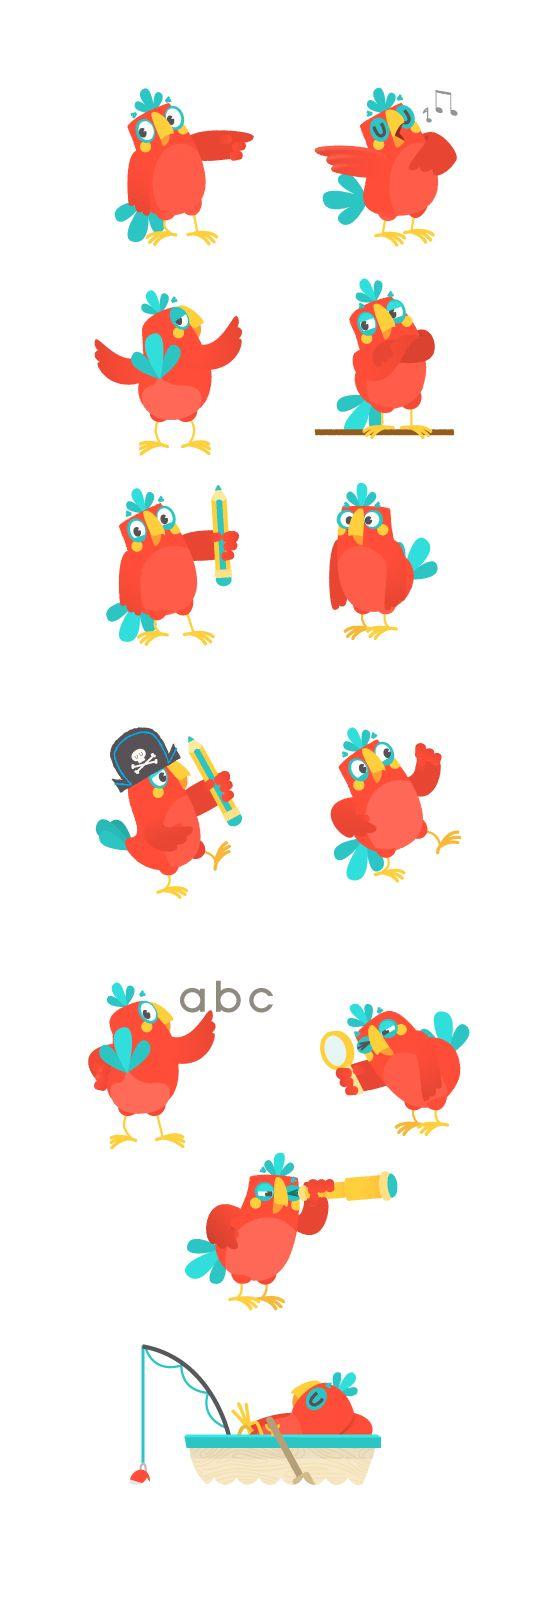 bird character design Eyes is part of Best Bird Images Character Design Drawings Character - Parrot character design sheet ~ Hanimator 2015